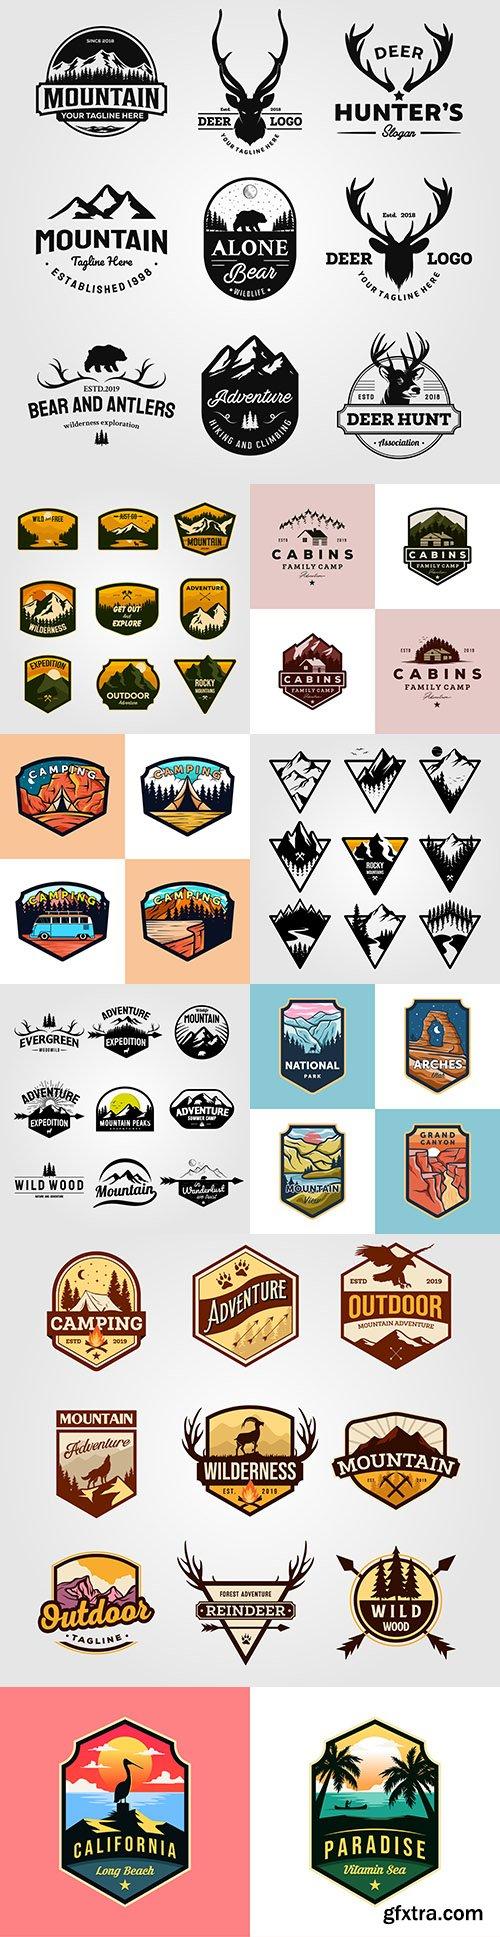 Camping and hunting emblems vintage design